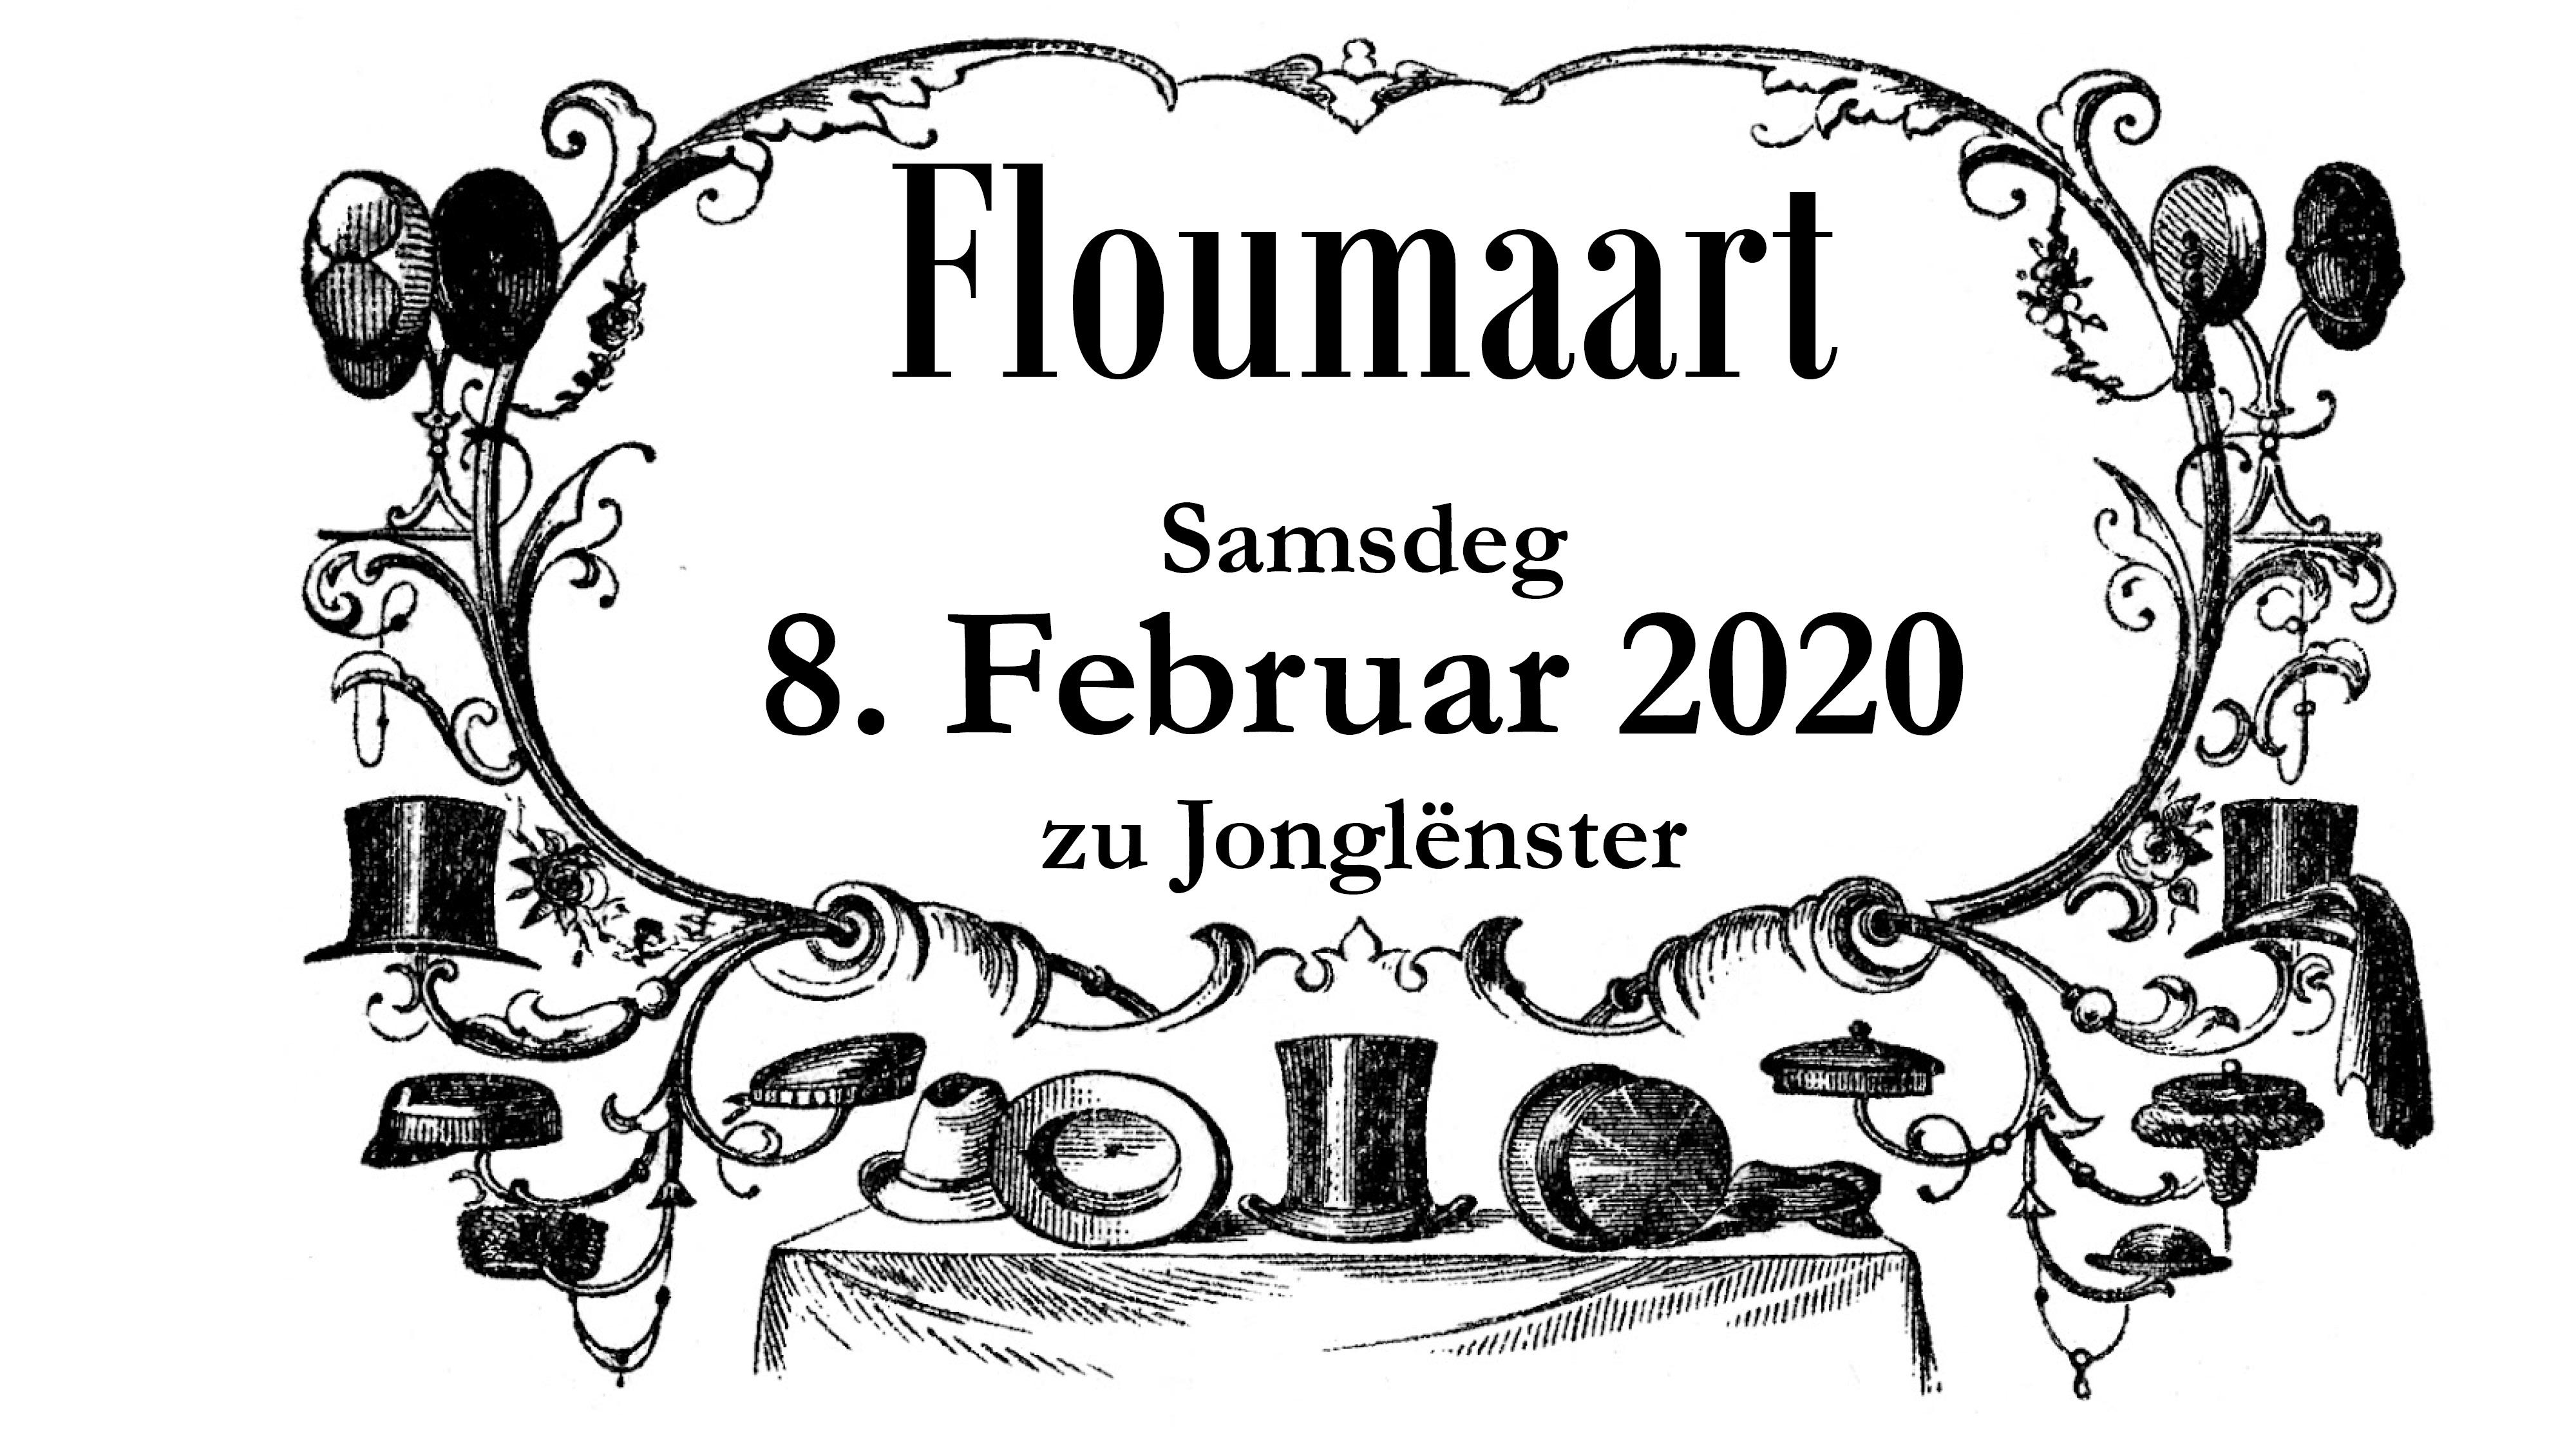 Floumaart